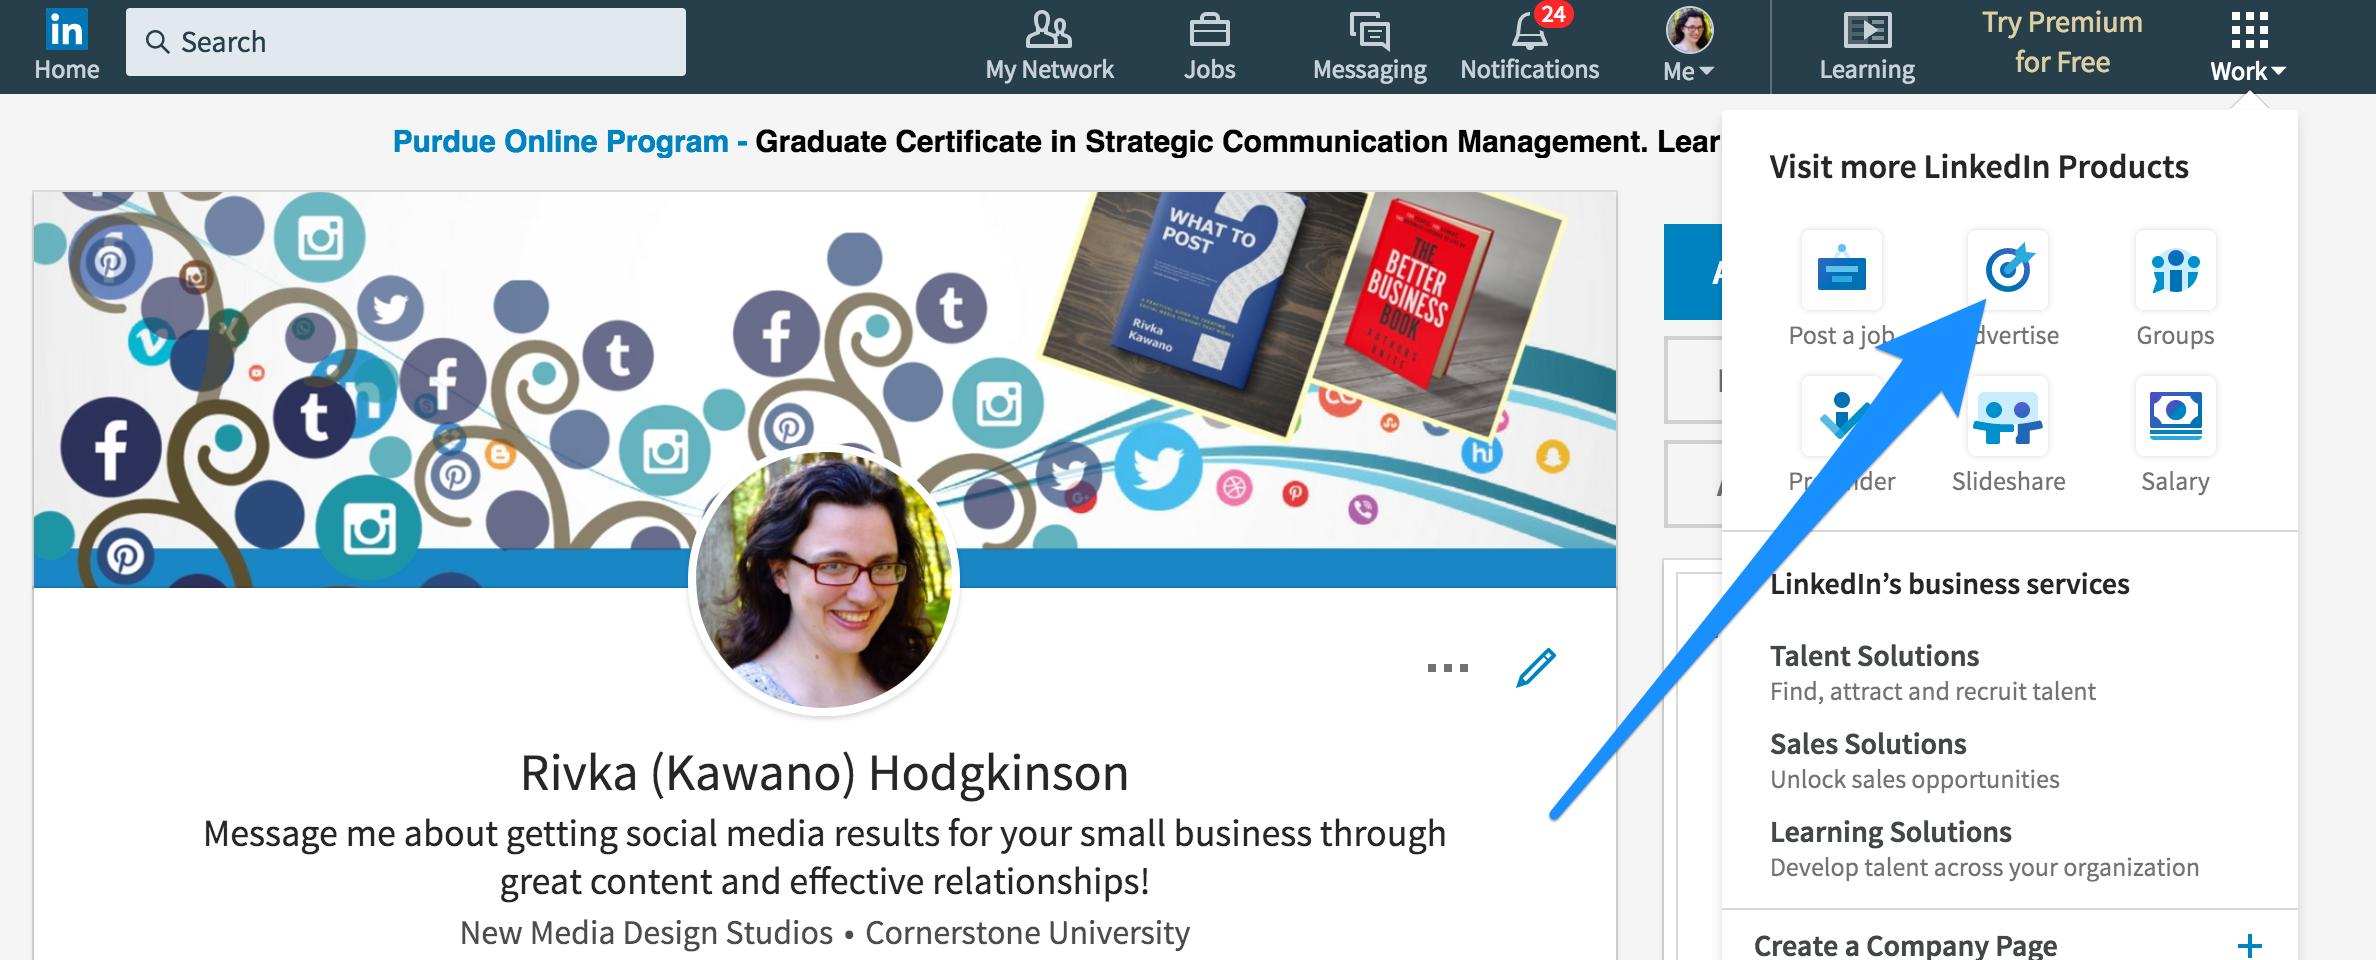 How to use LinkedIn Lead Ads -- screenshot 1